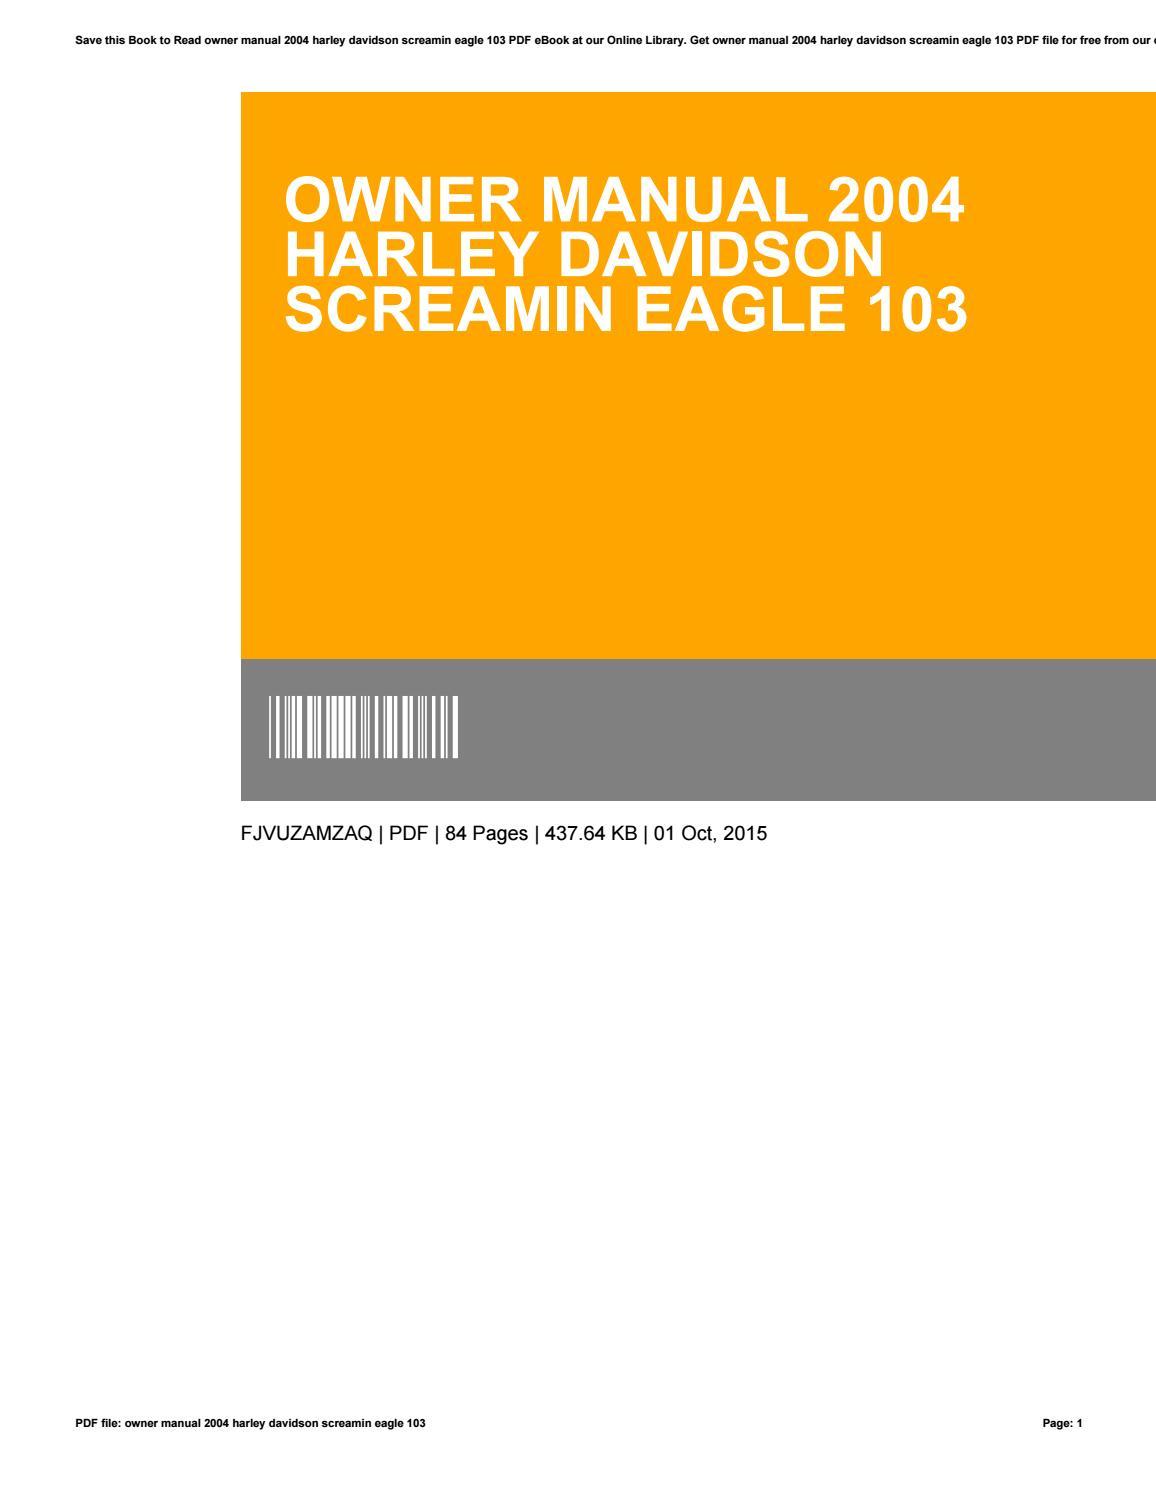 Owner manual 2004 harley davidson screamin eagle 103 by PaulFrank3545 -  issuu